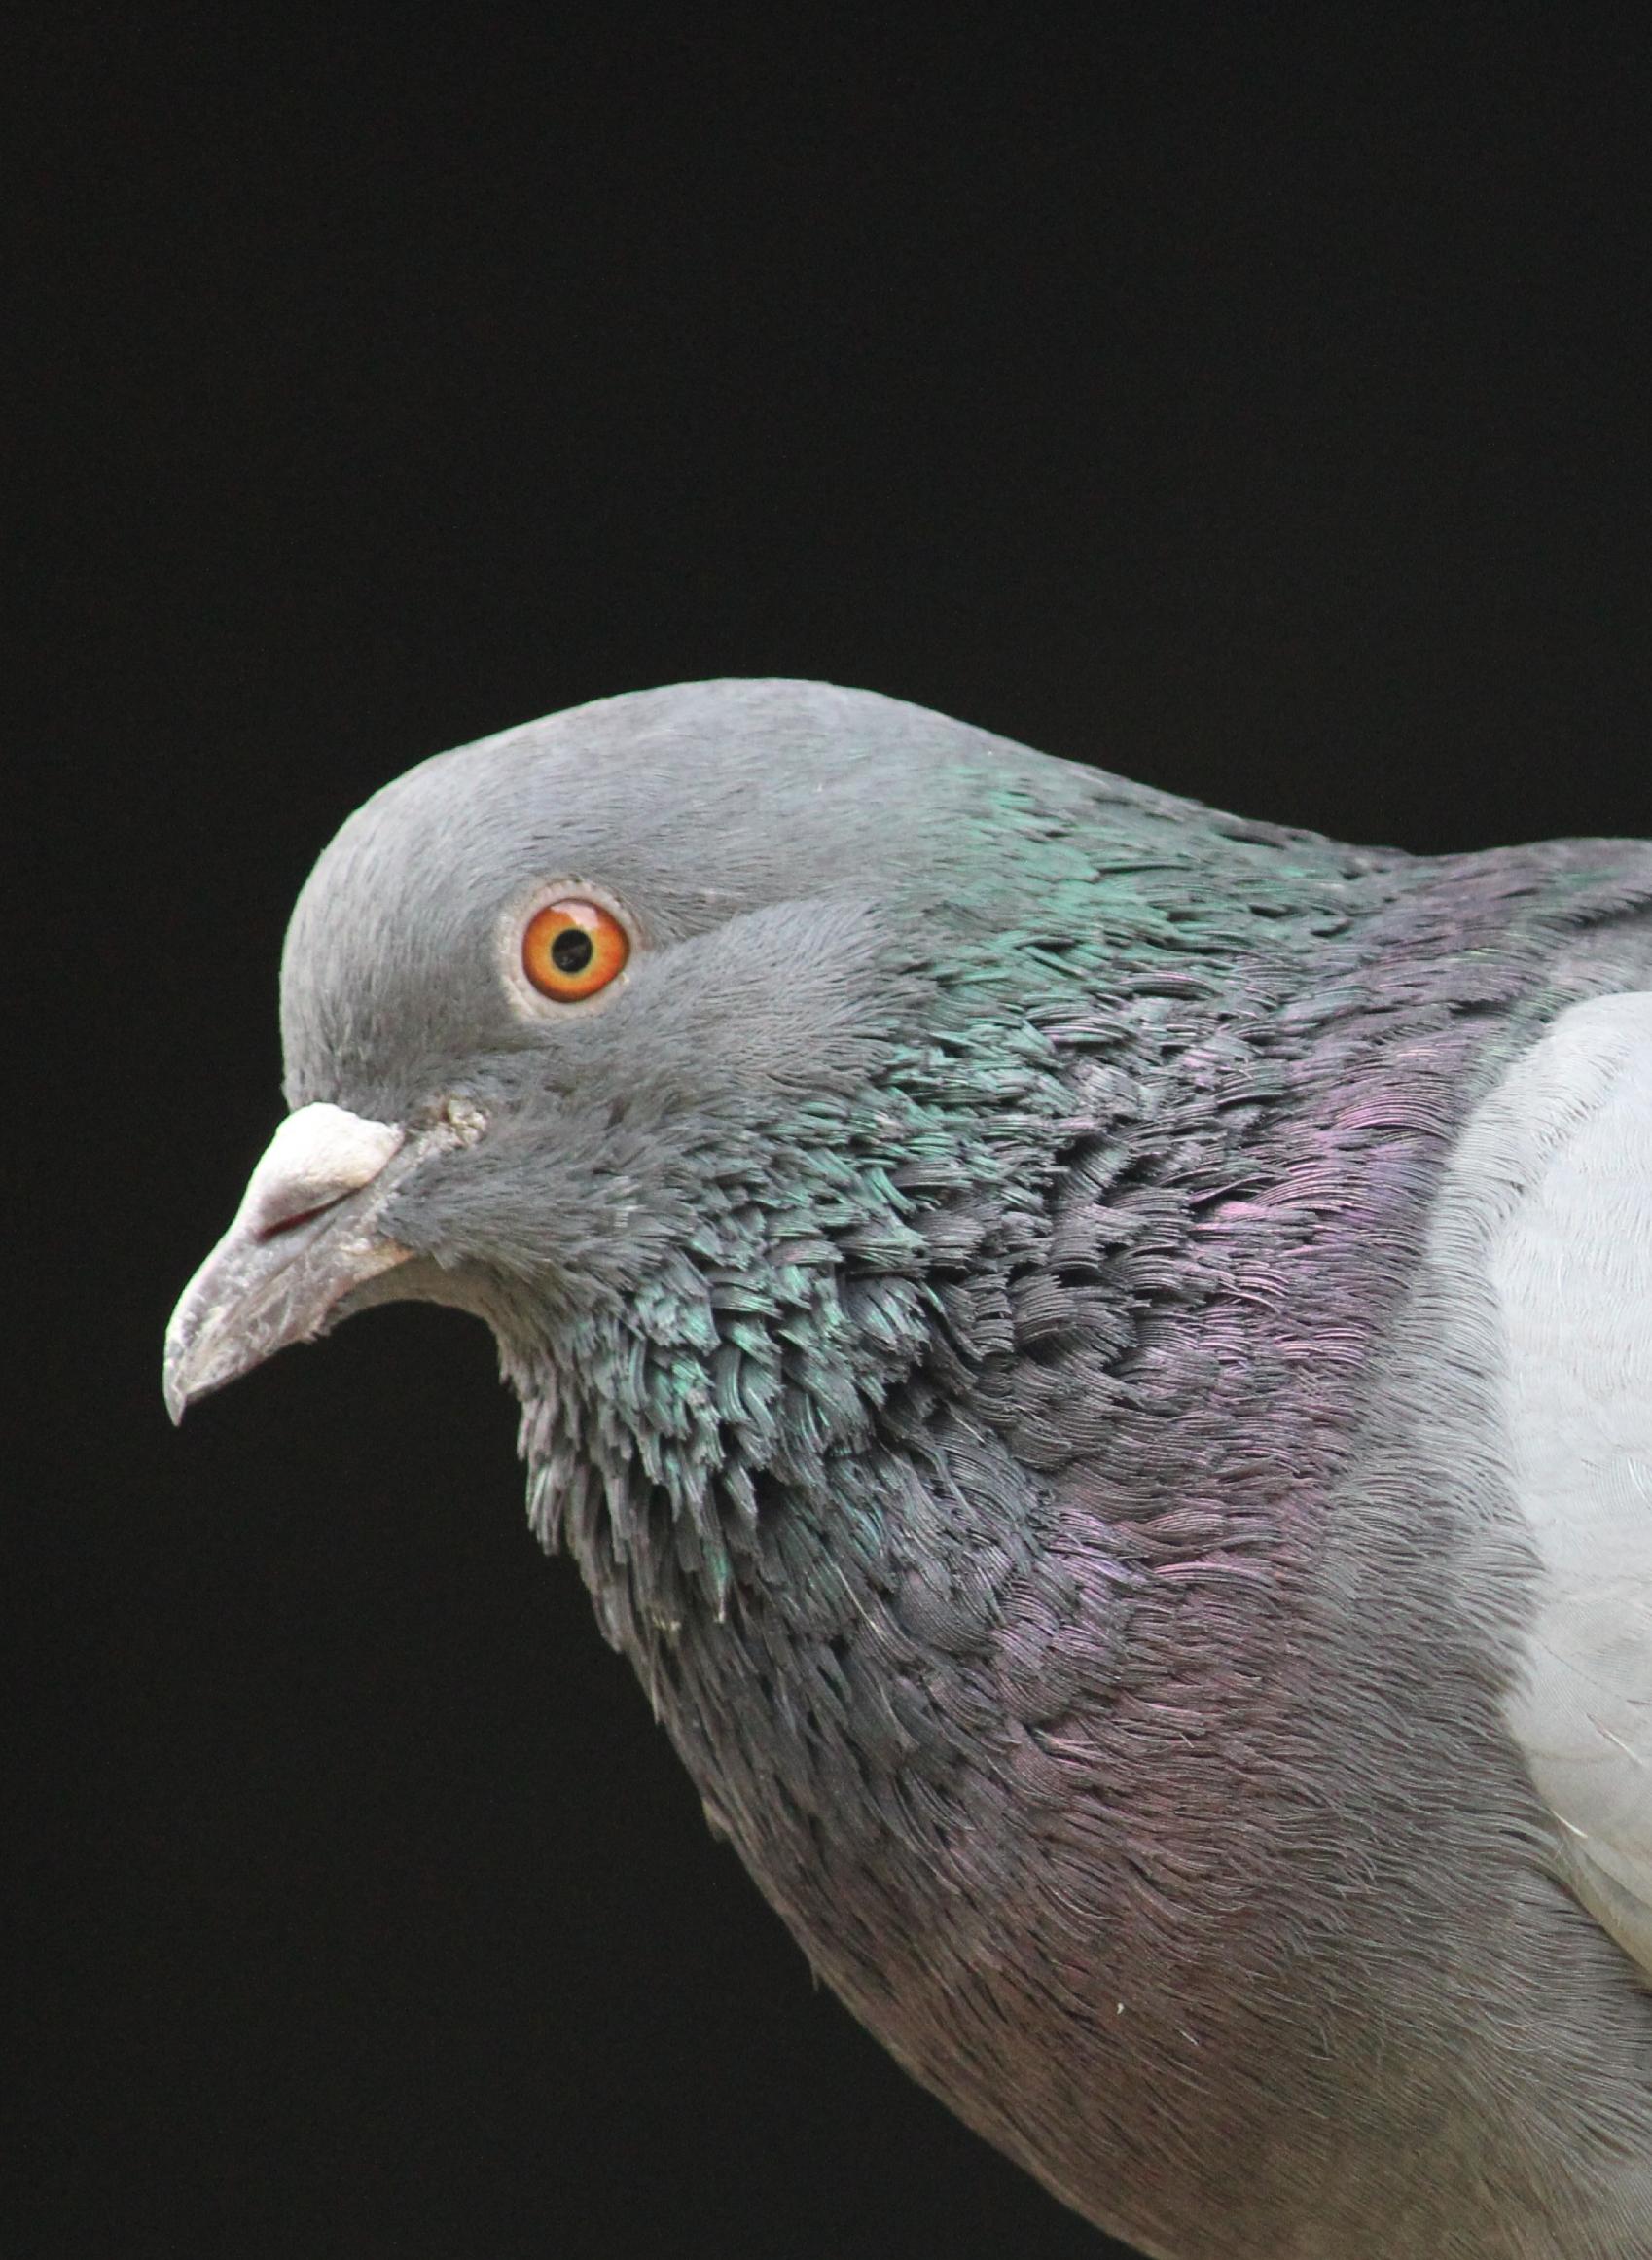 Pigeon's Head on Close-up